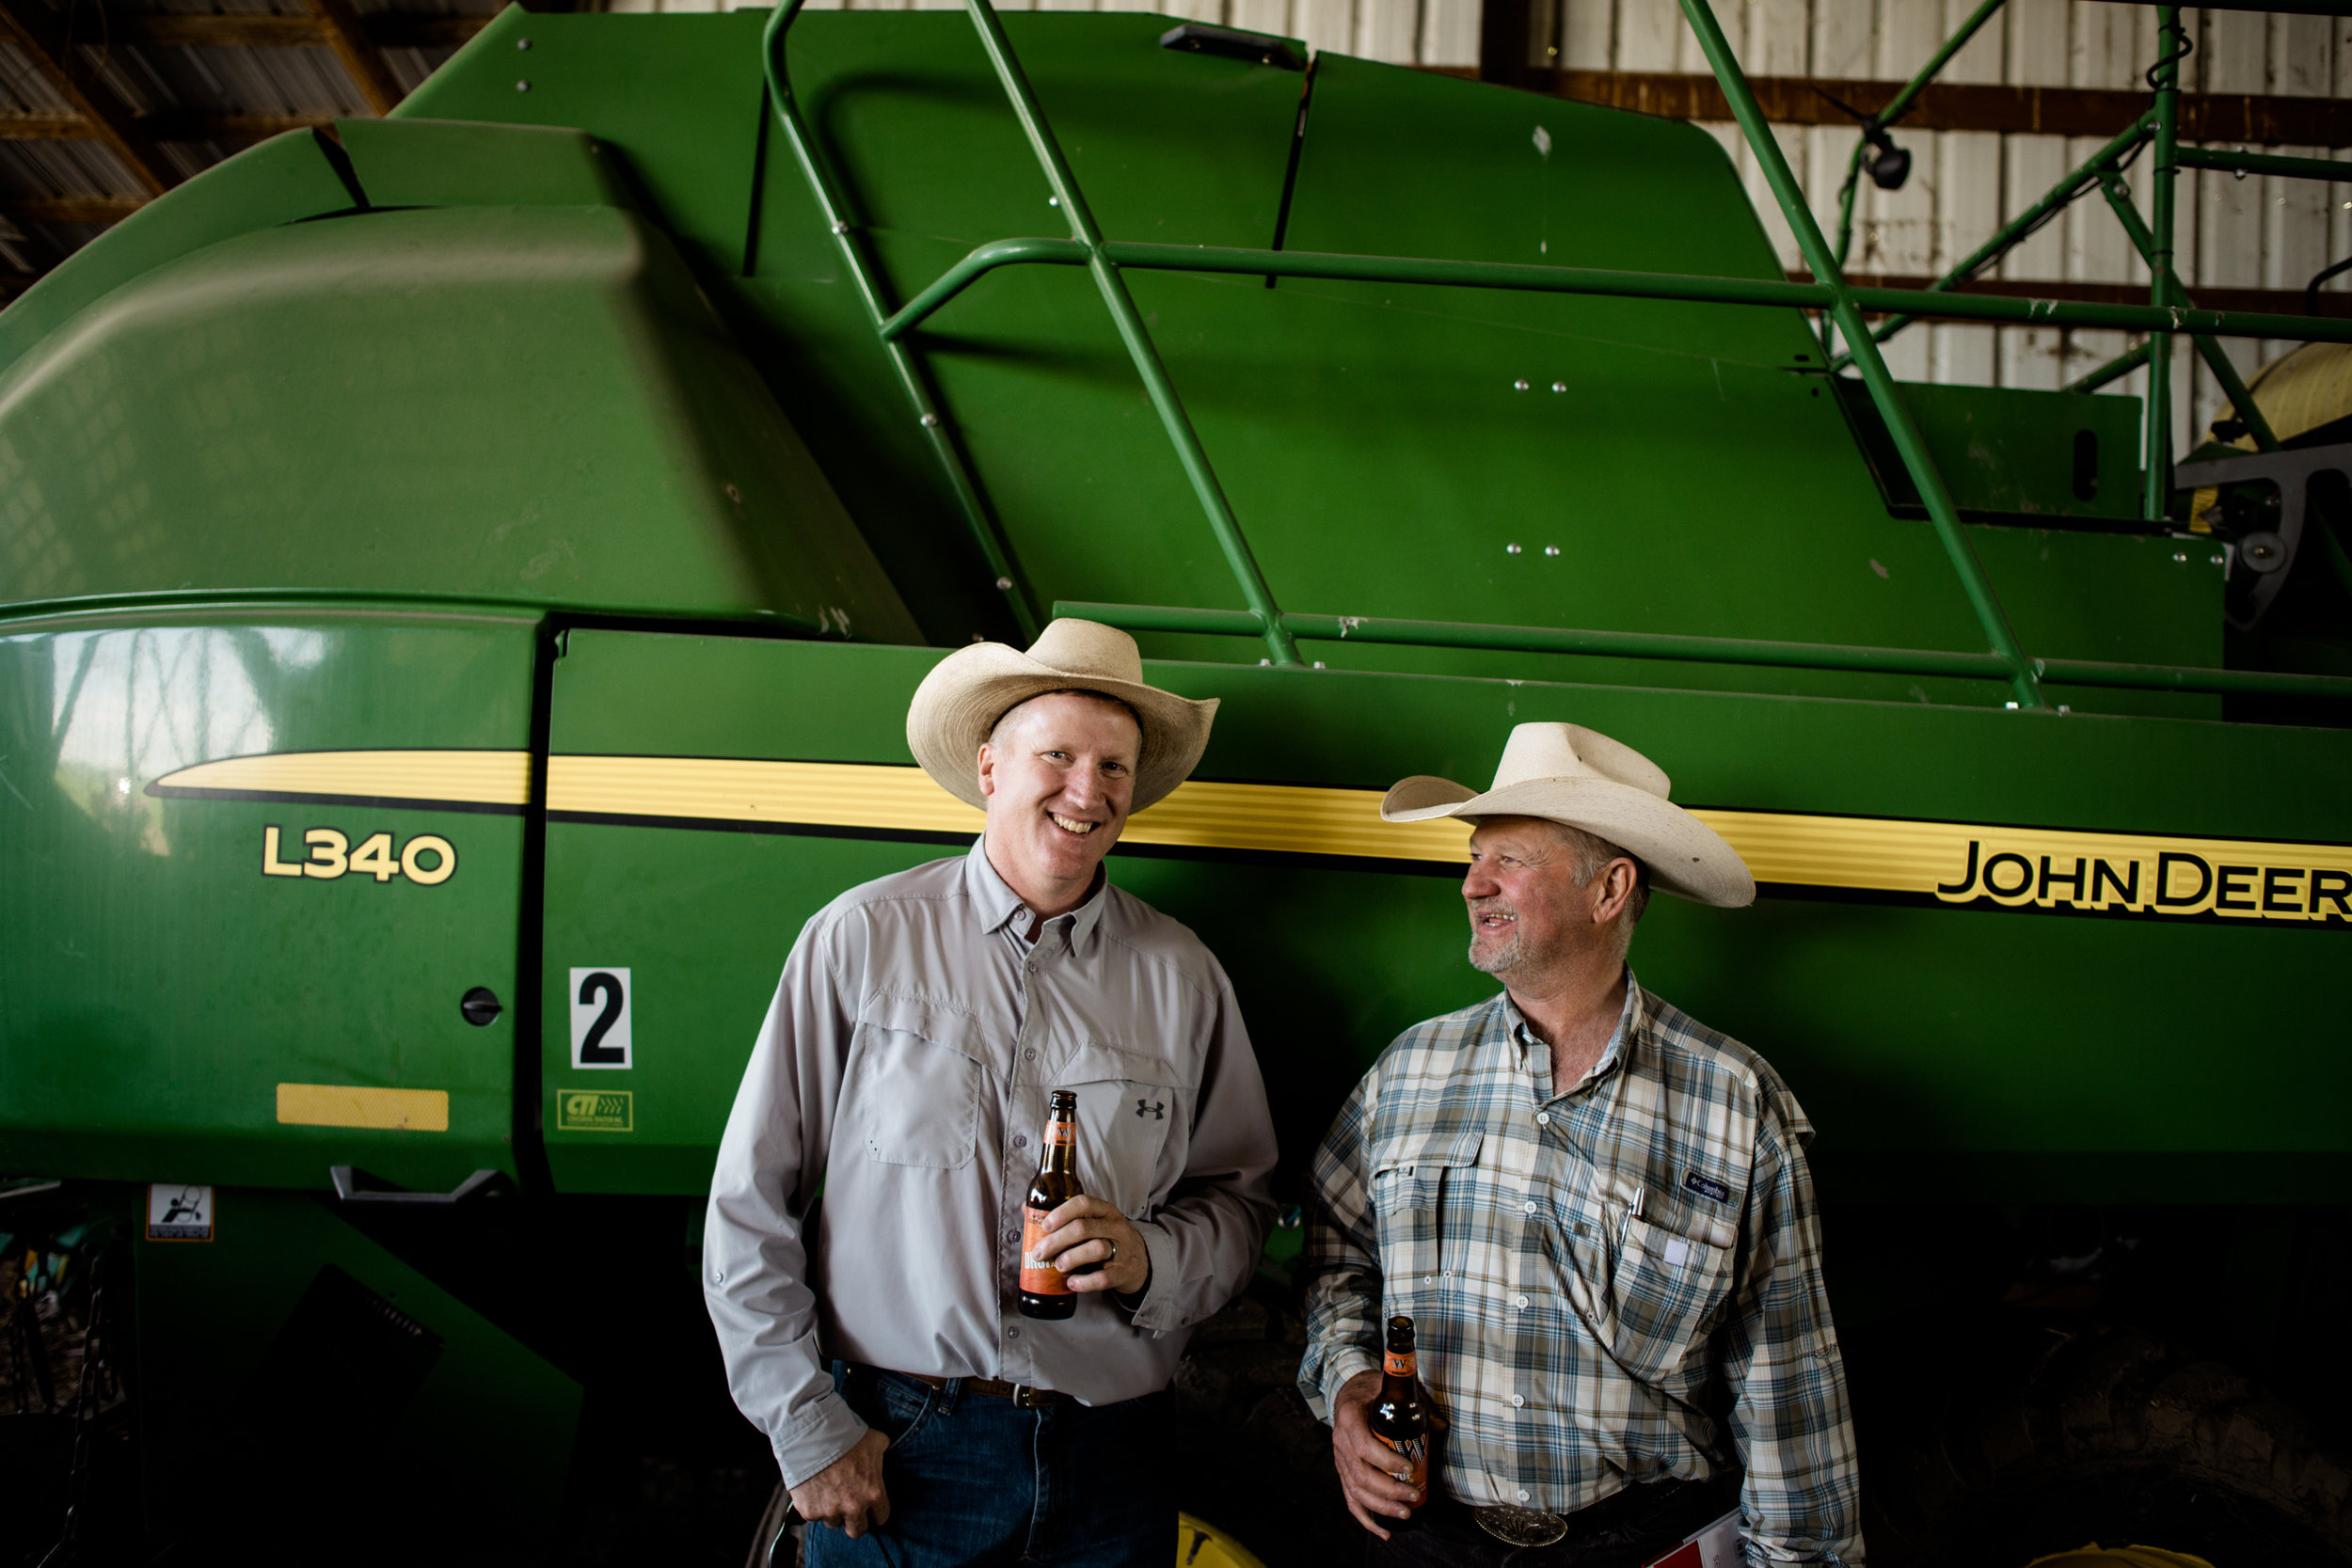 Cory_Carman_Producers_Wallowa_Oregon_Carman_Ranch_By_Talia_Jean_Galvin--44.jpg